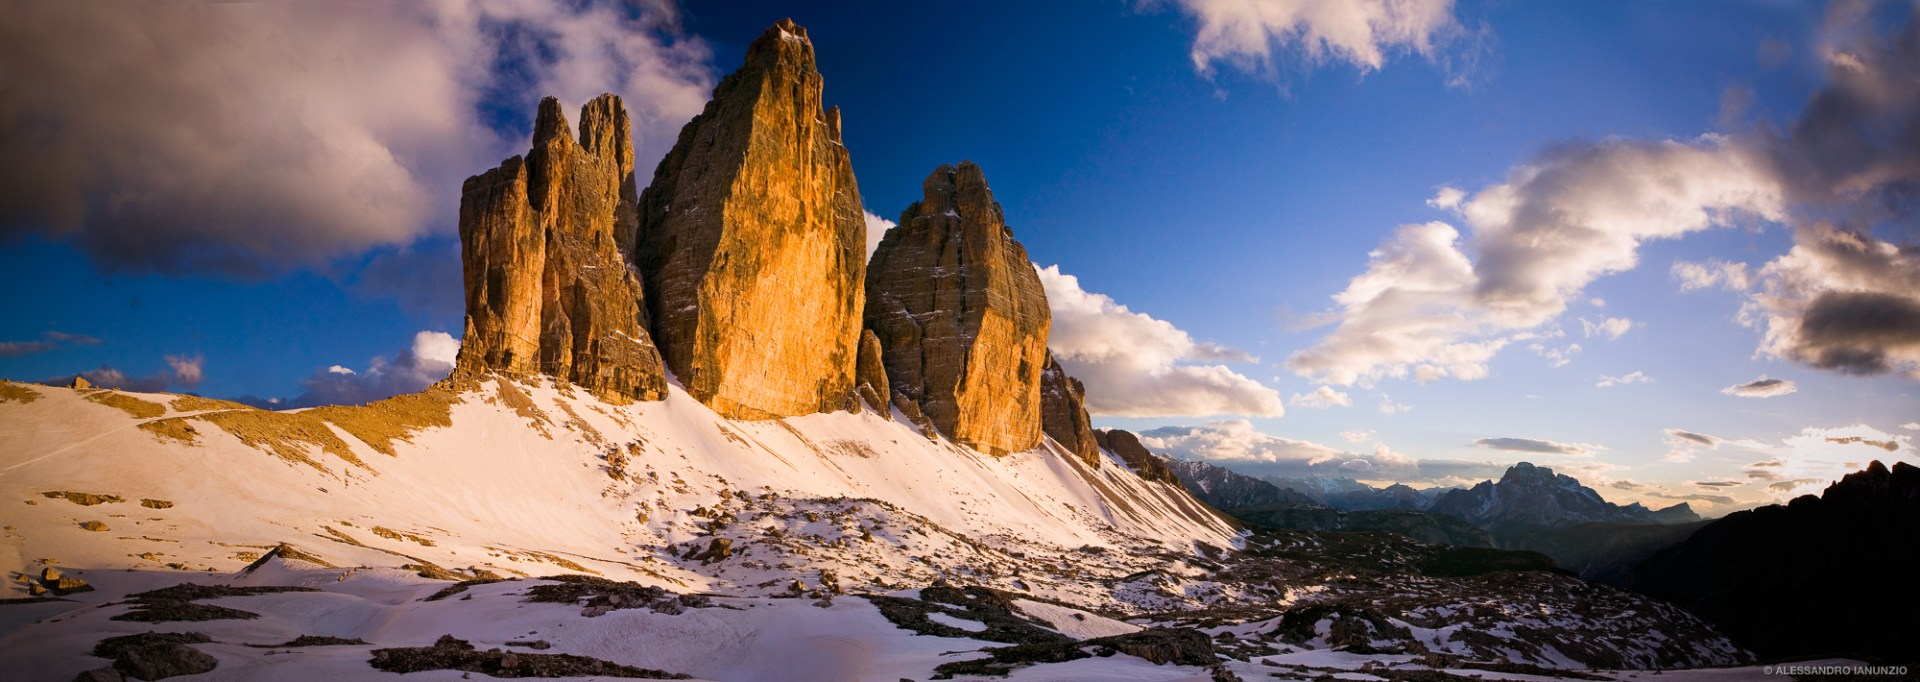 Tre Cime di Lavaredo, Dolomiti